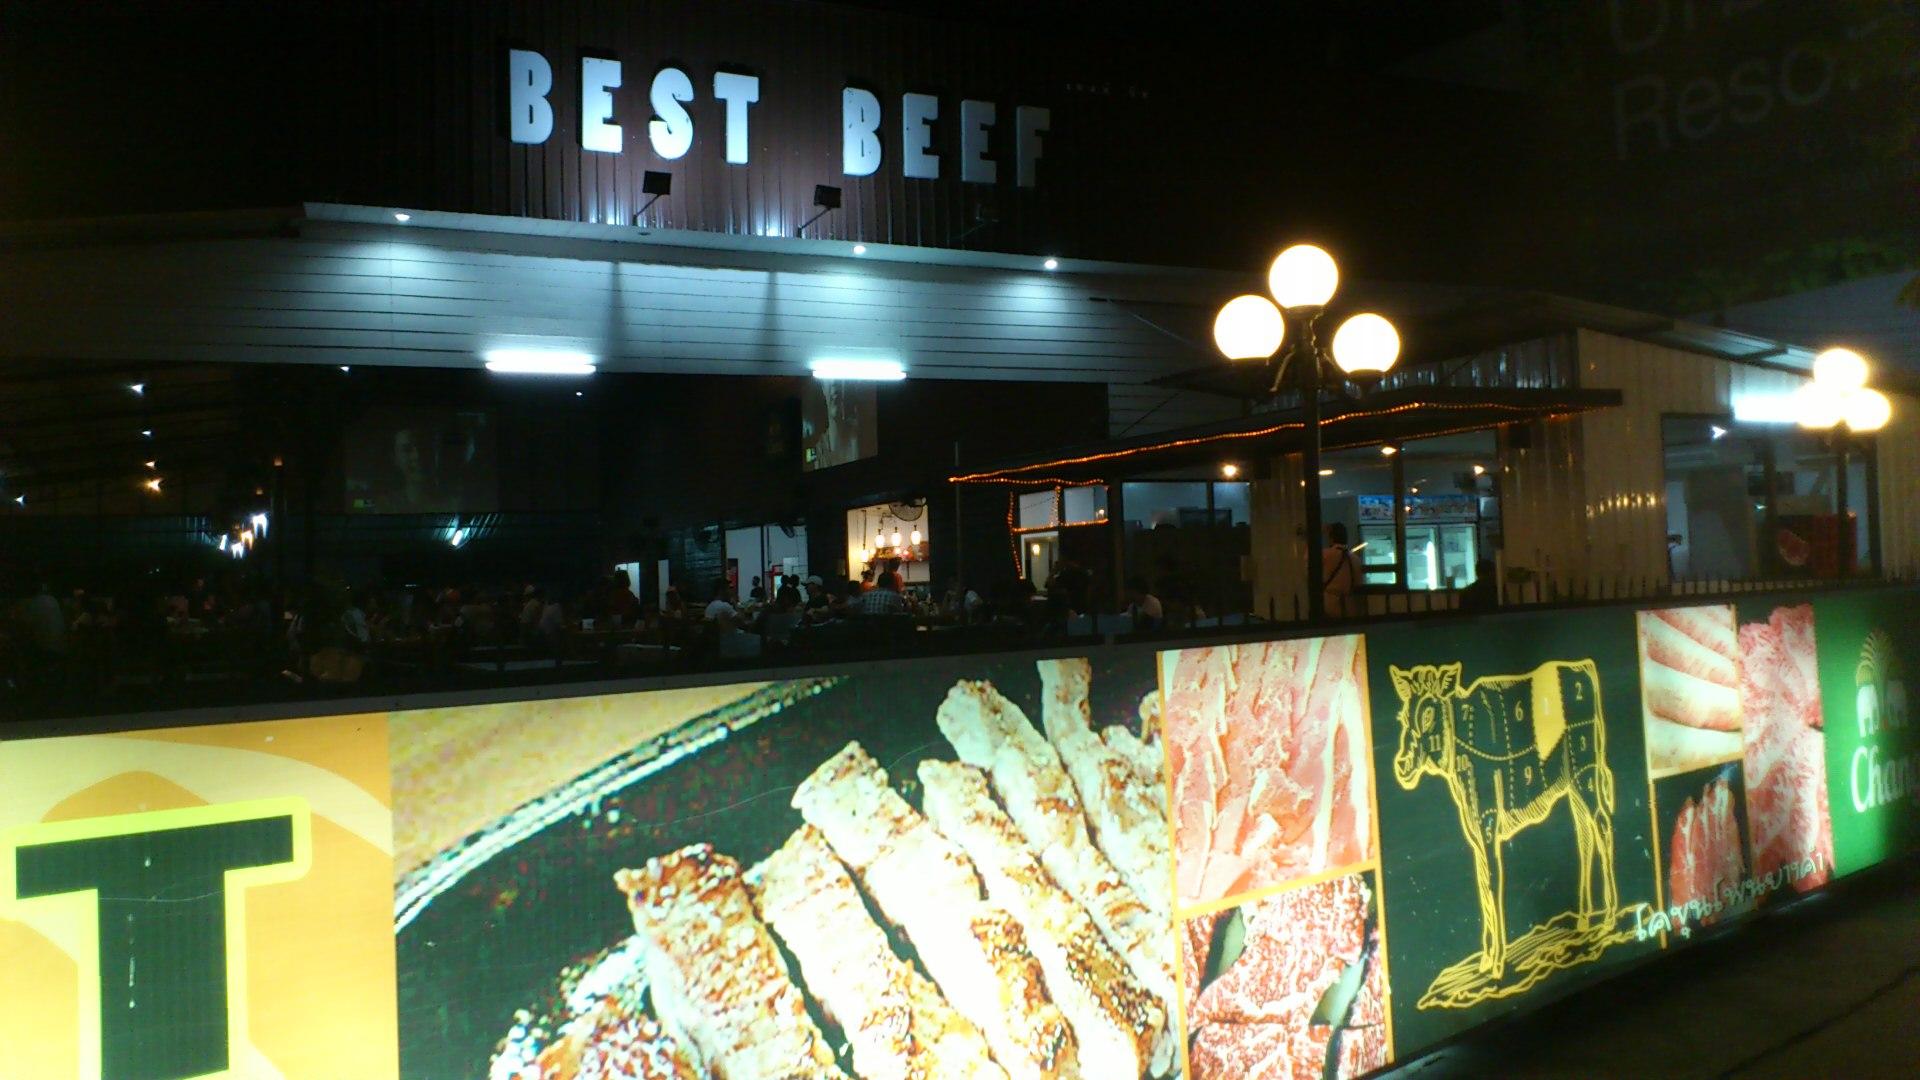 best beef 外観